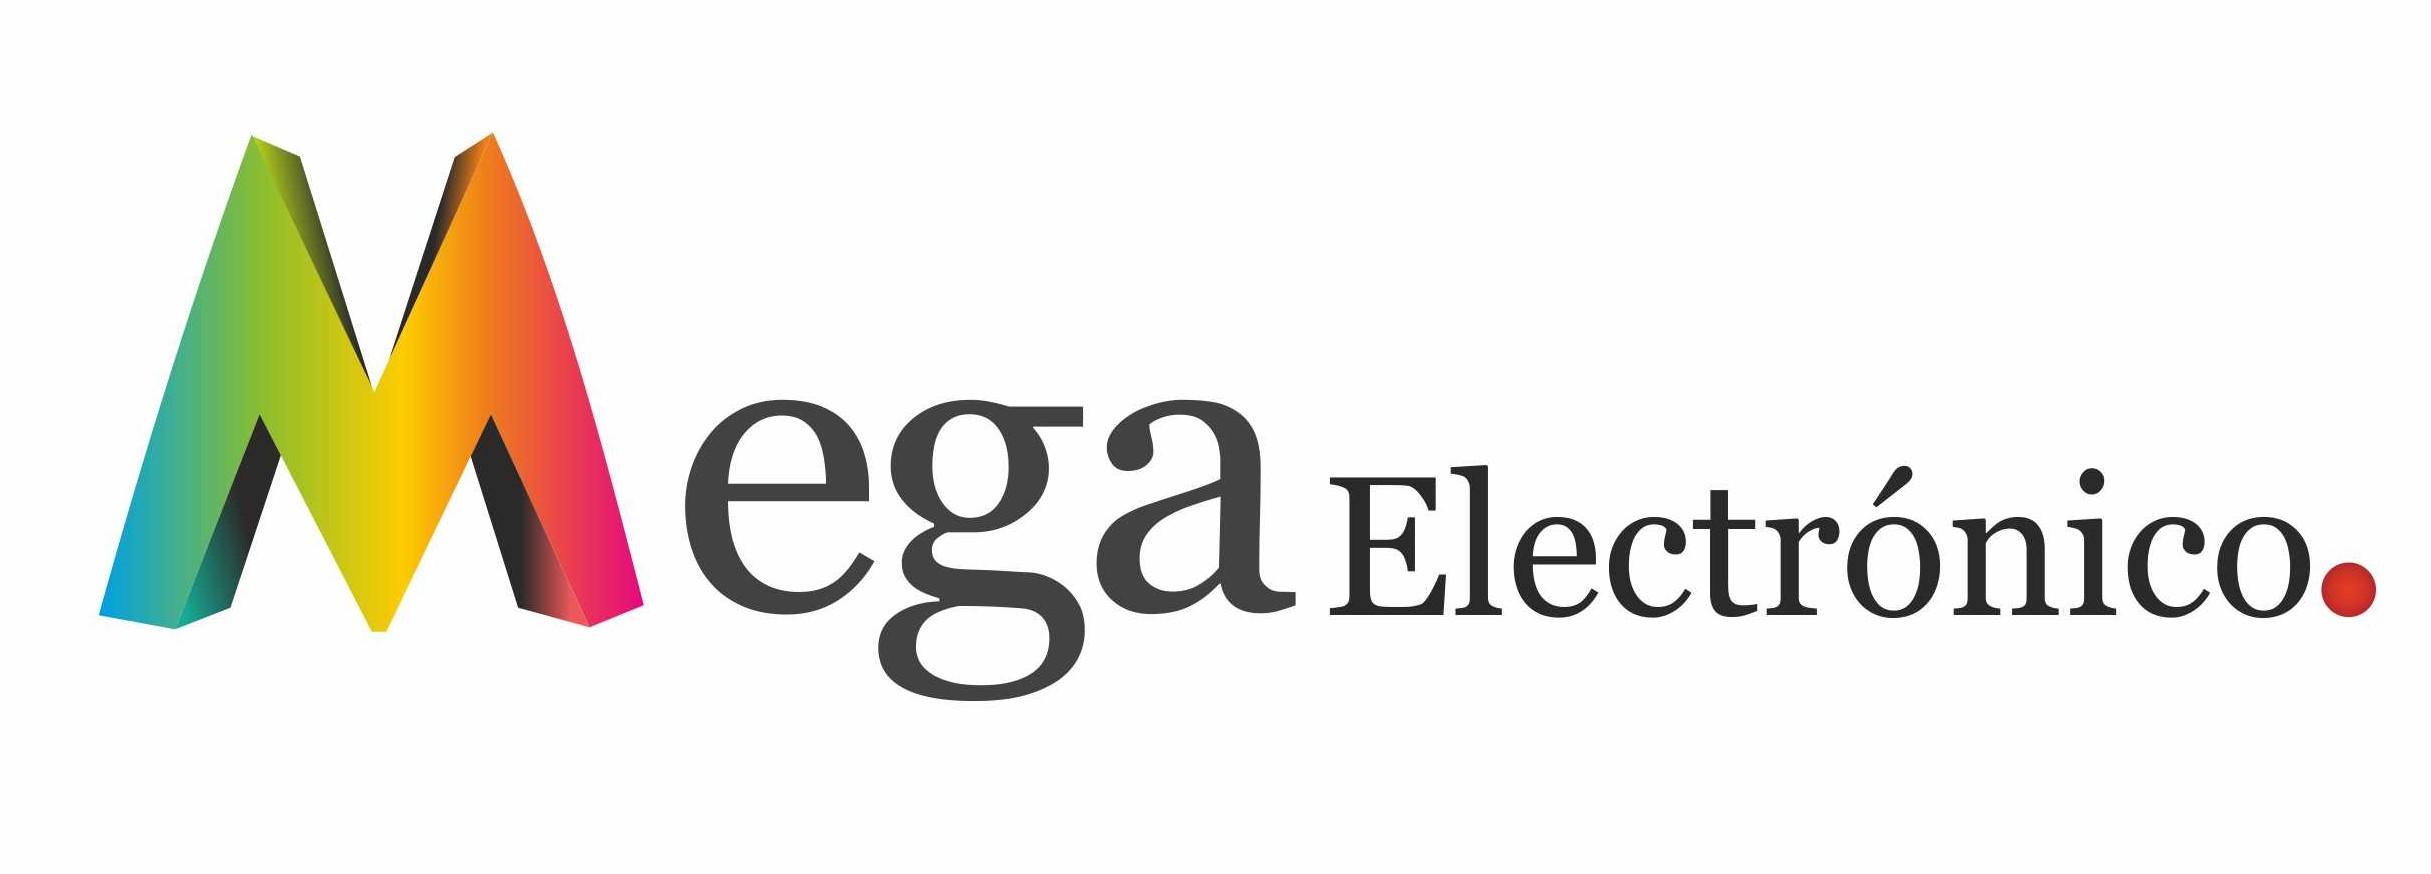 Megaelectronico